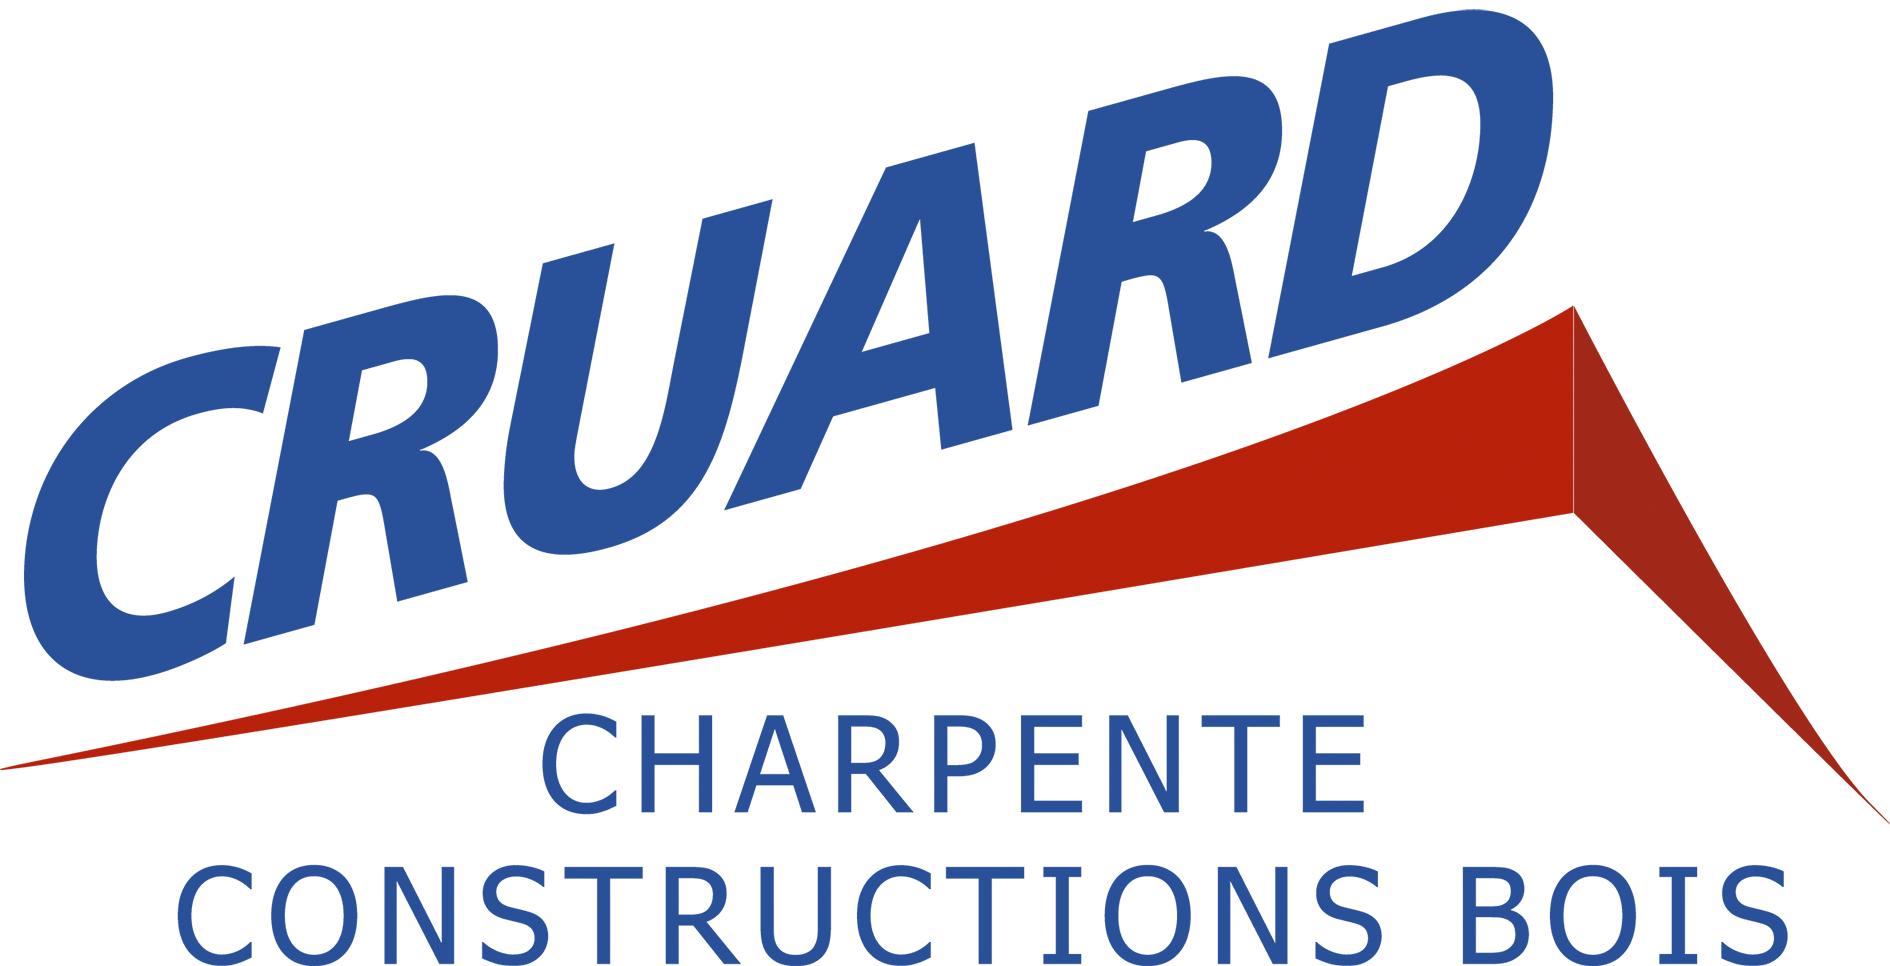 https://hybridal.fr/wp-content/uploads/2021/03/CRUARD-CHARPENTE-CONSTRUCTION-BOIS-logo-quadri.png